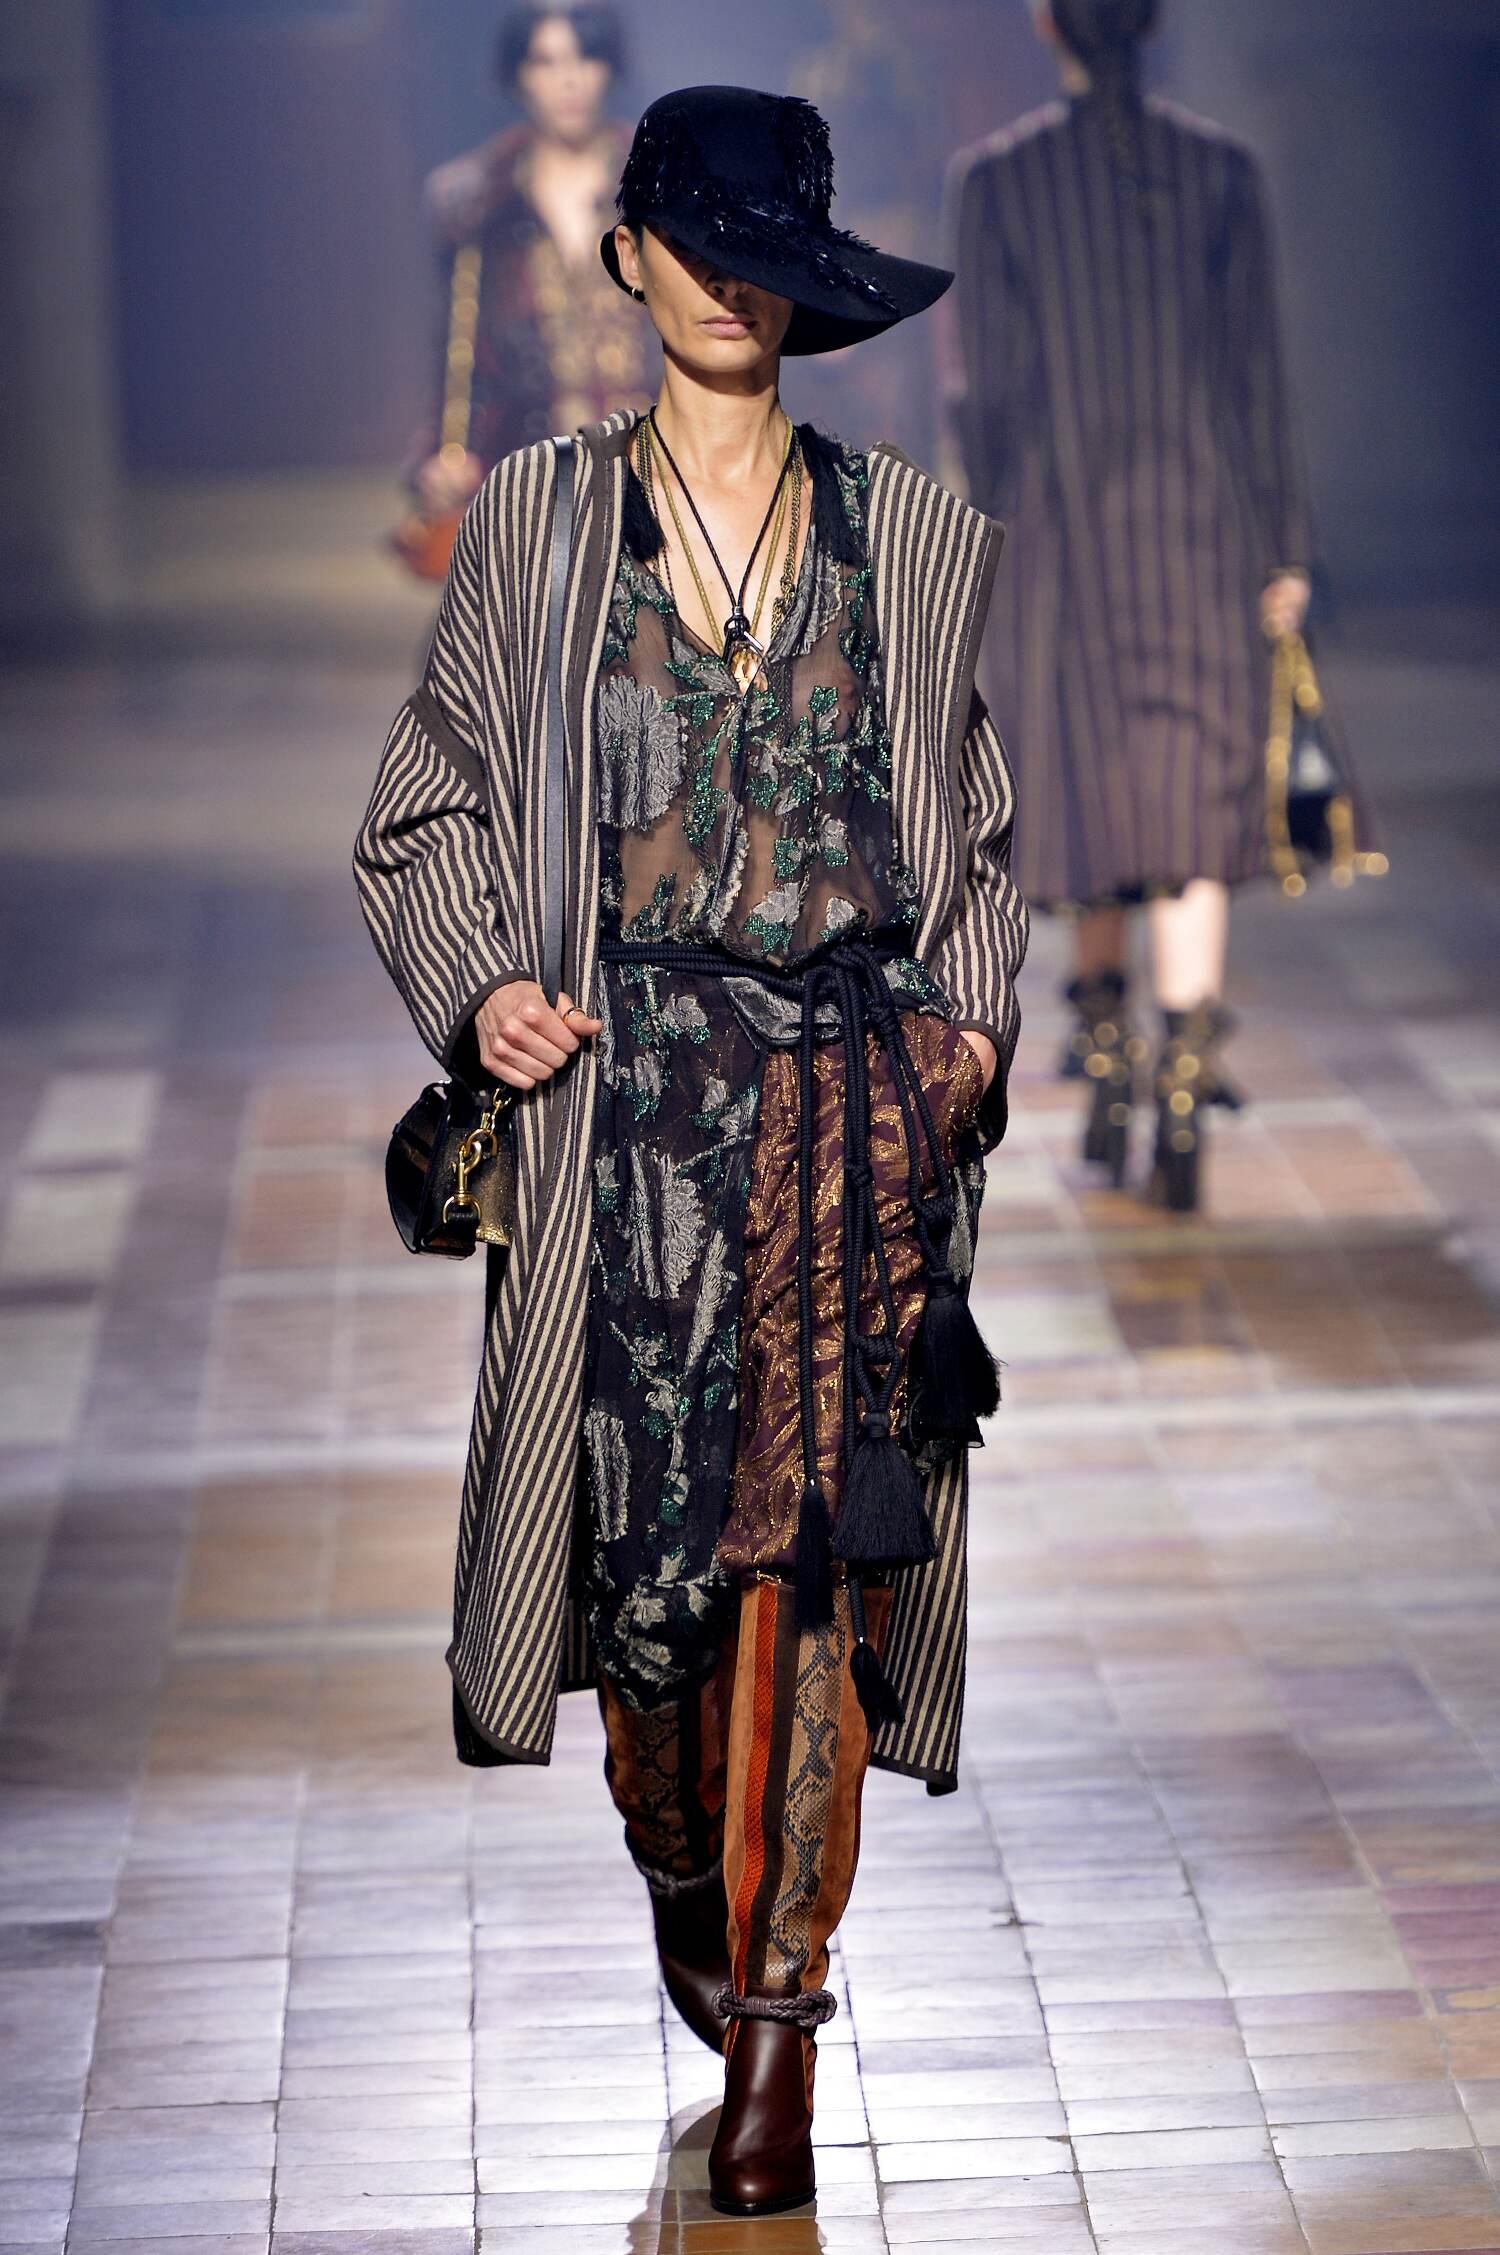 Catwalk Lanvin Fall Winter 2015 16 Women's Collection Paris Fashion Week